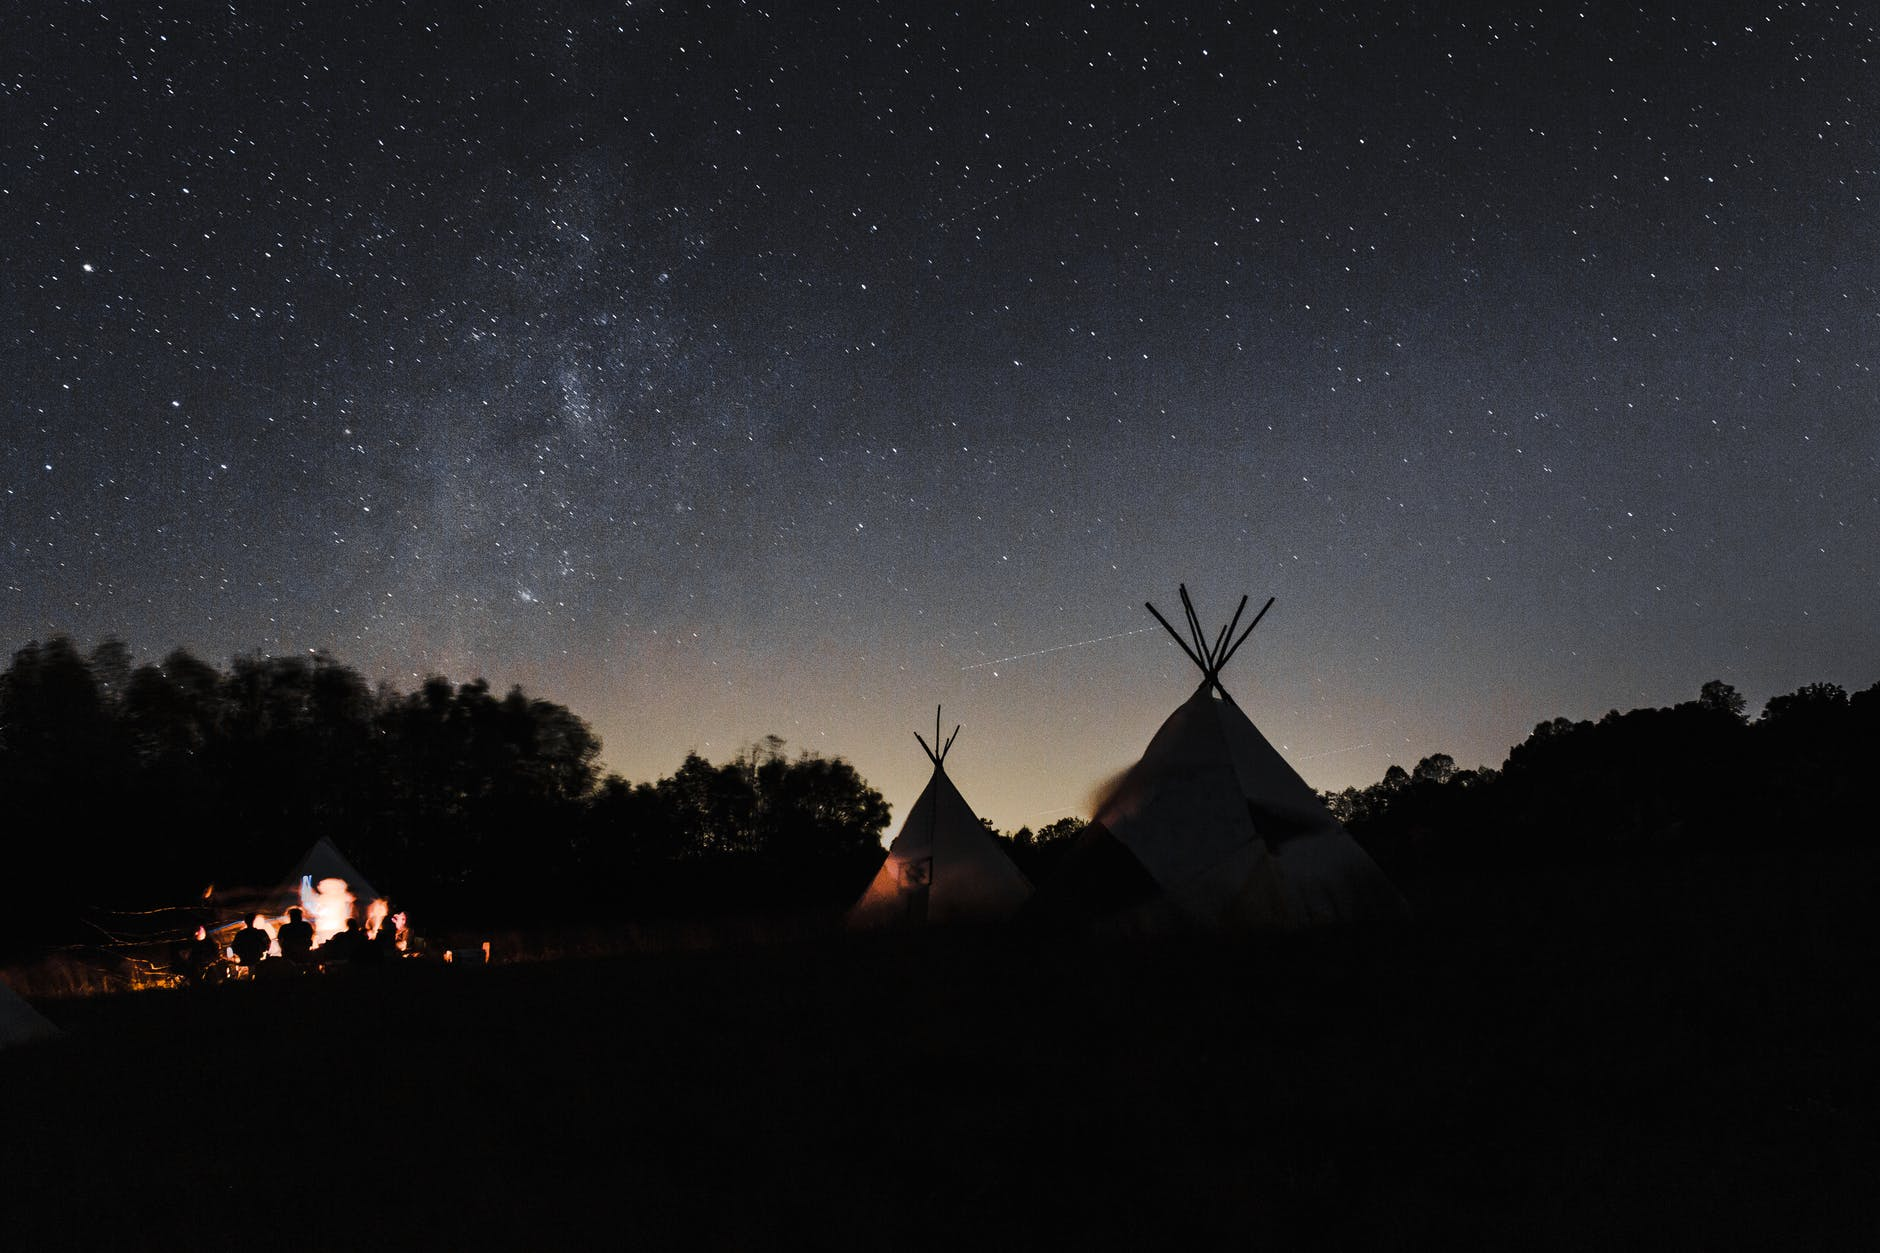 tent under starry night sky